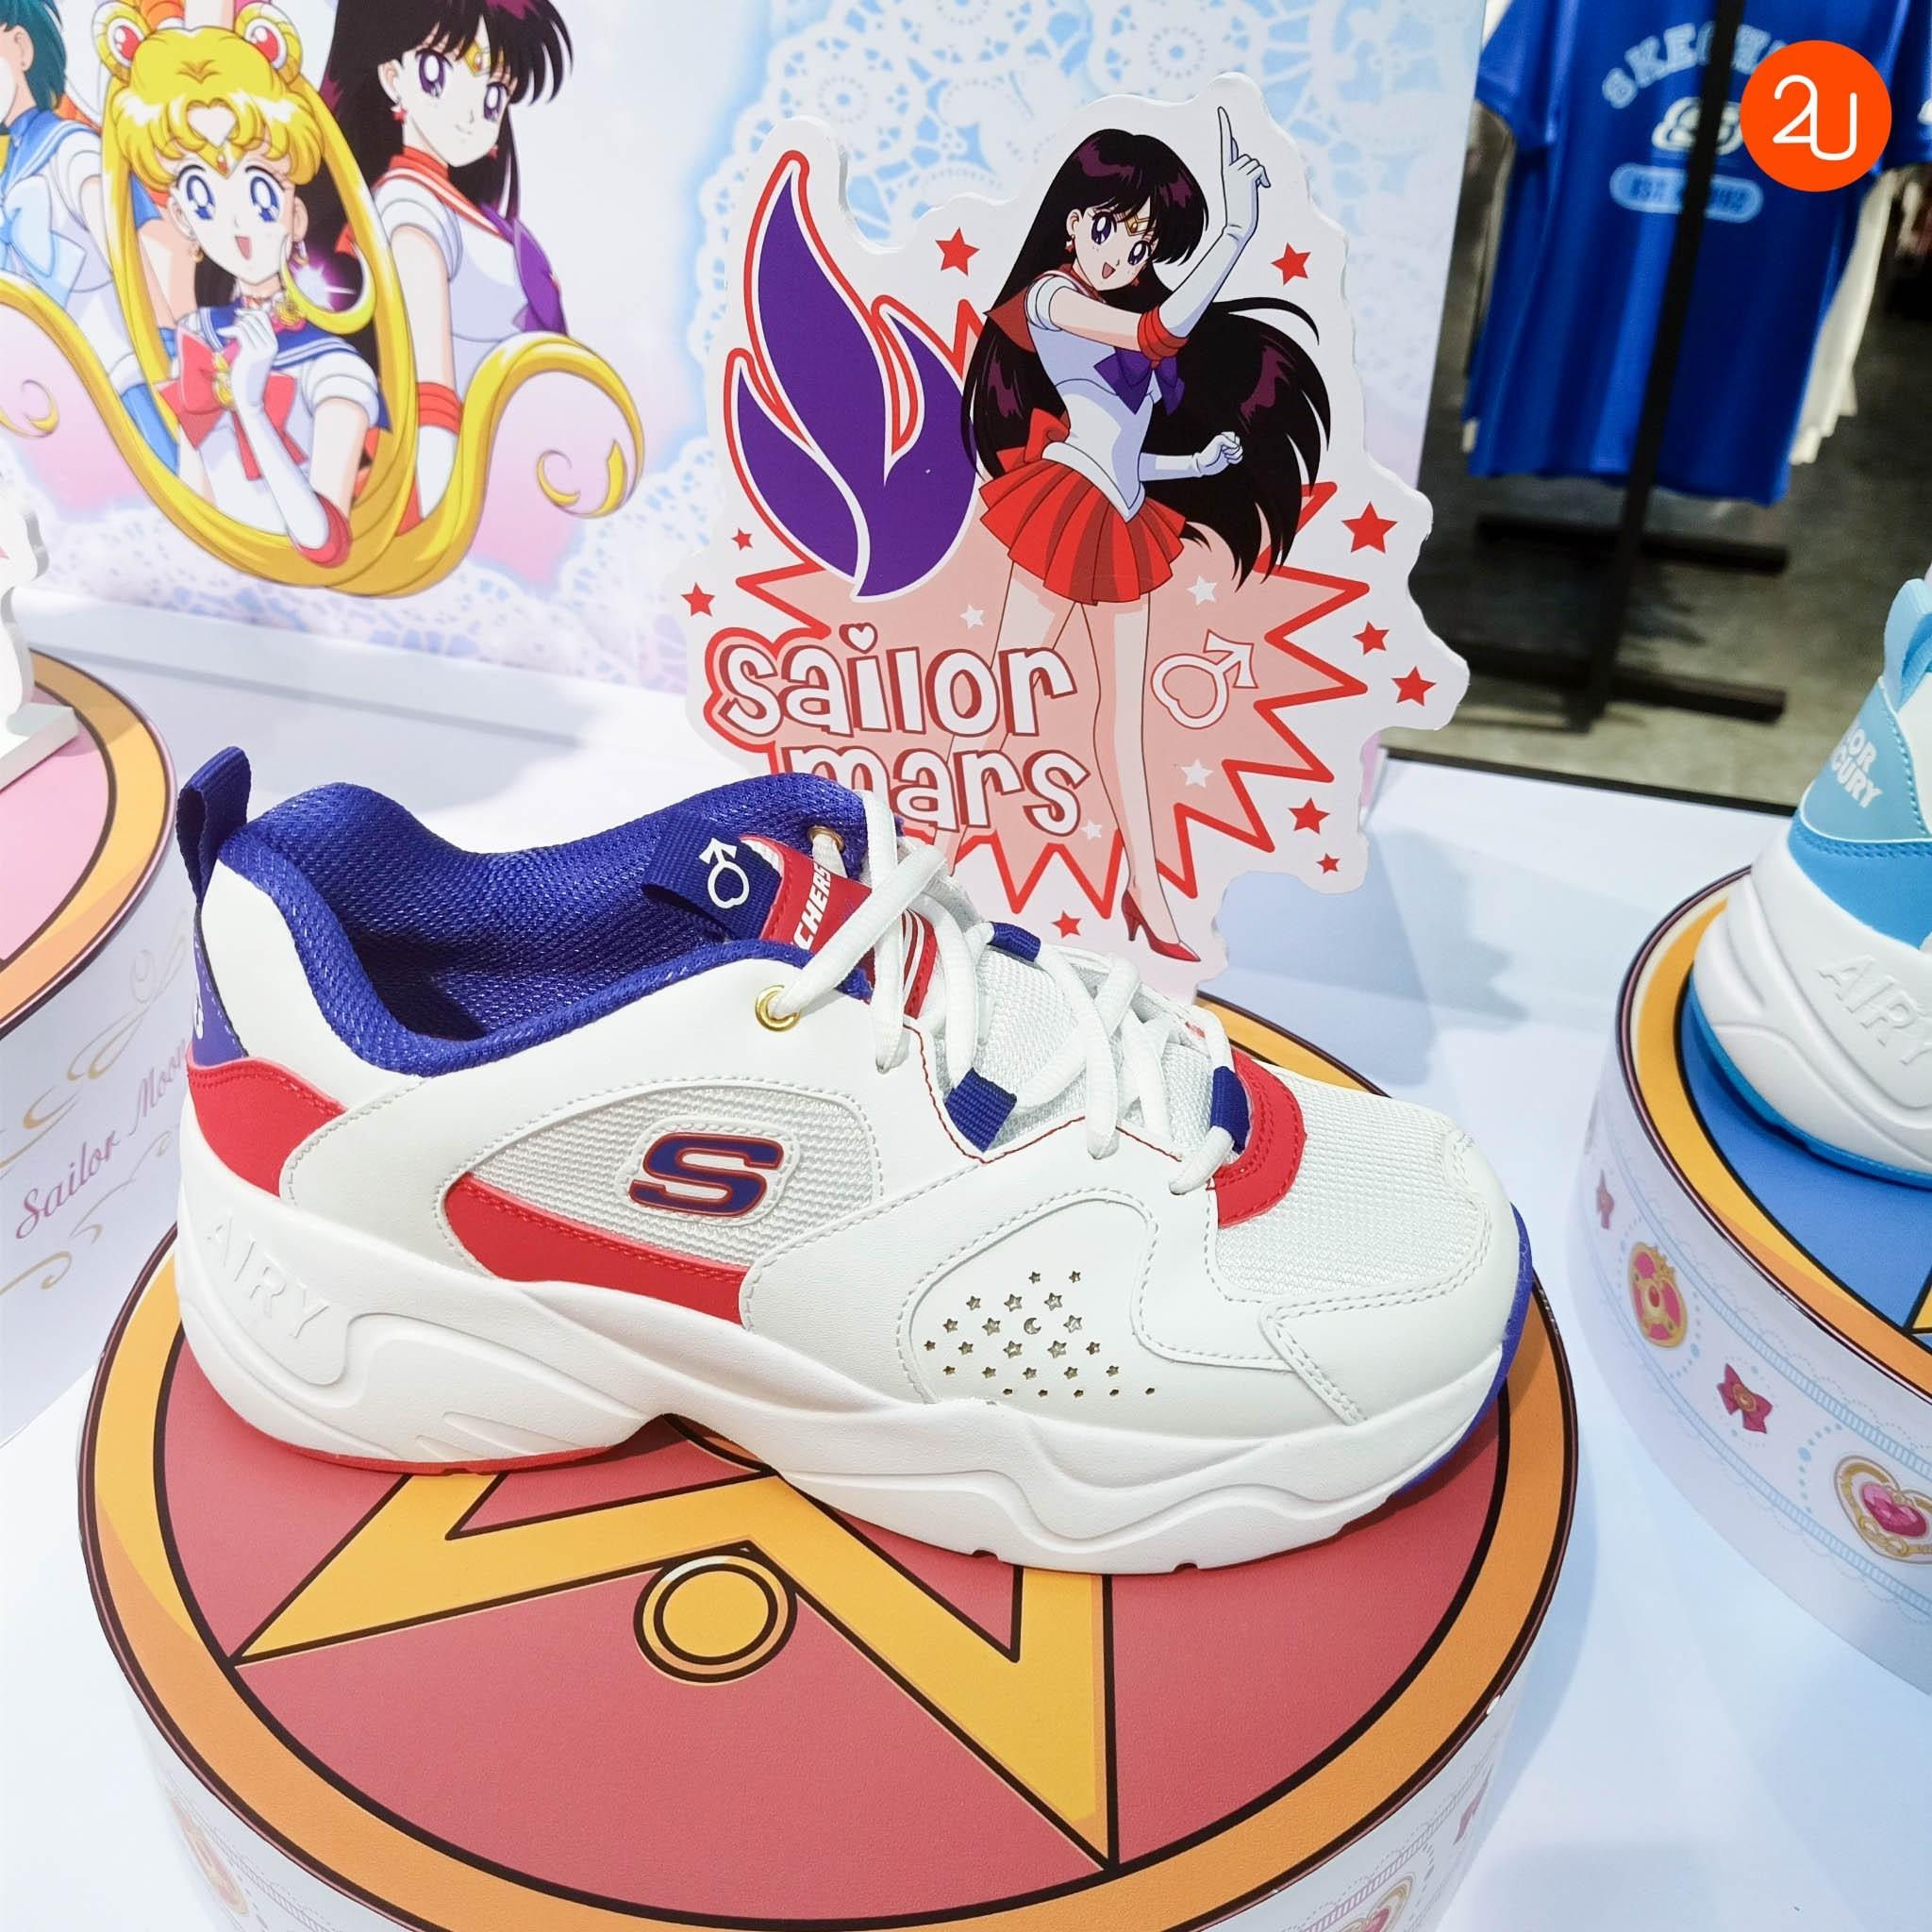 Sailor Mars (1)